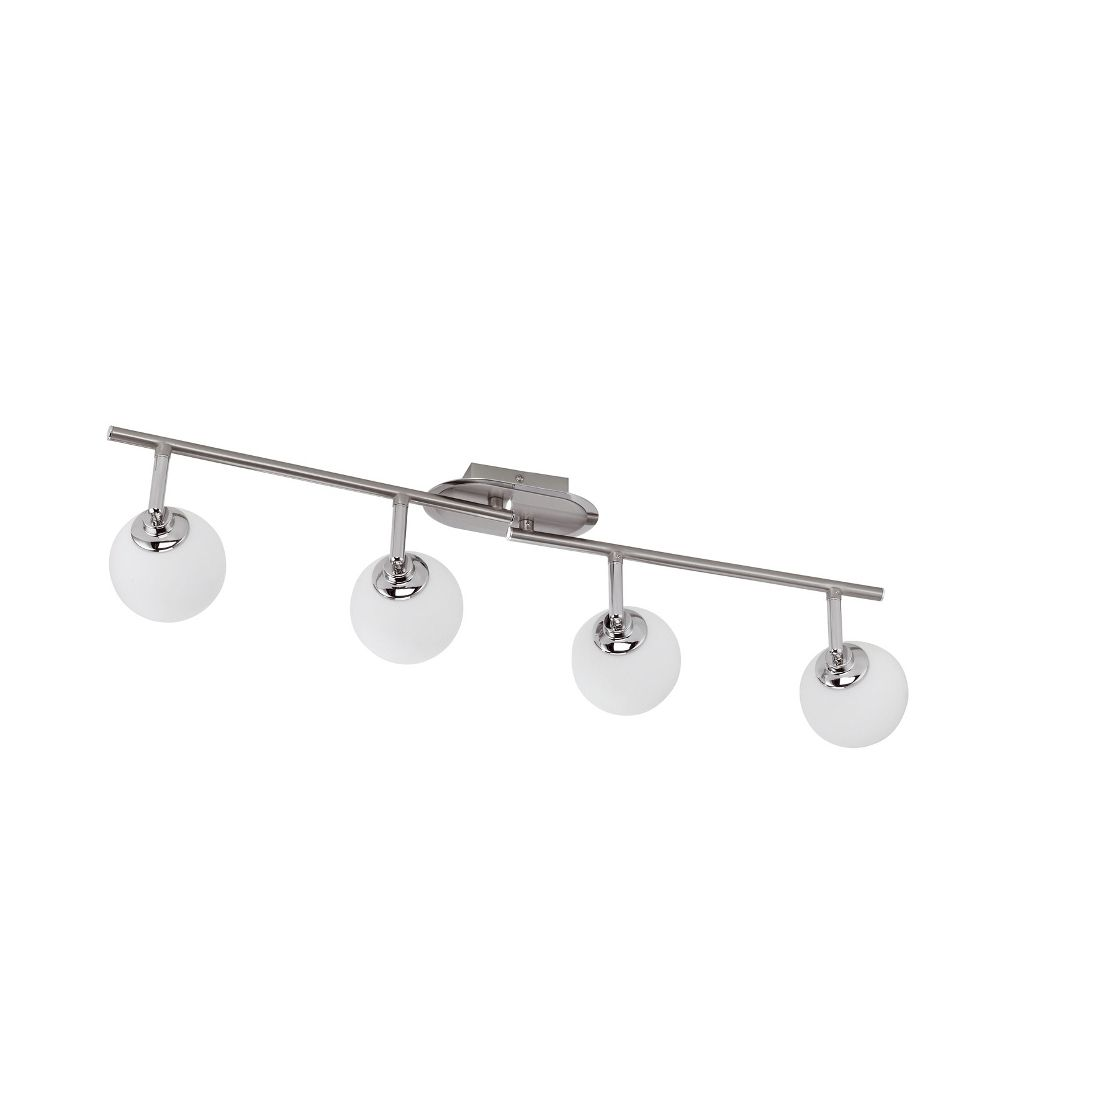 energie  A+, Plafondlamp Bola - 4 lichtbronnen - spots zijn draai- en kantelbaar - staal/opaalglas - metaalkleurig/wit, Paul Neuhaus